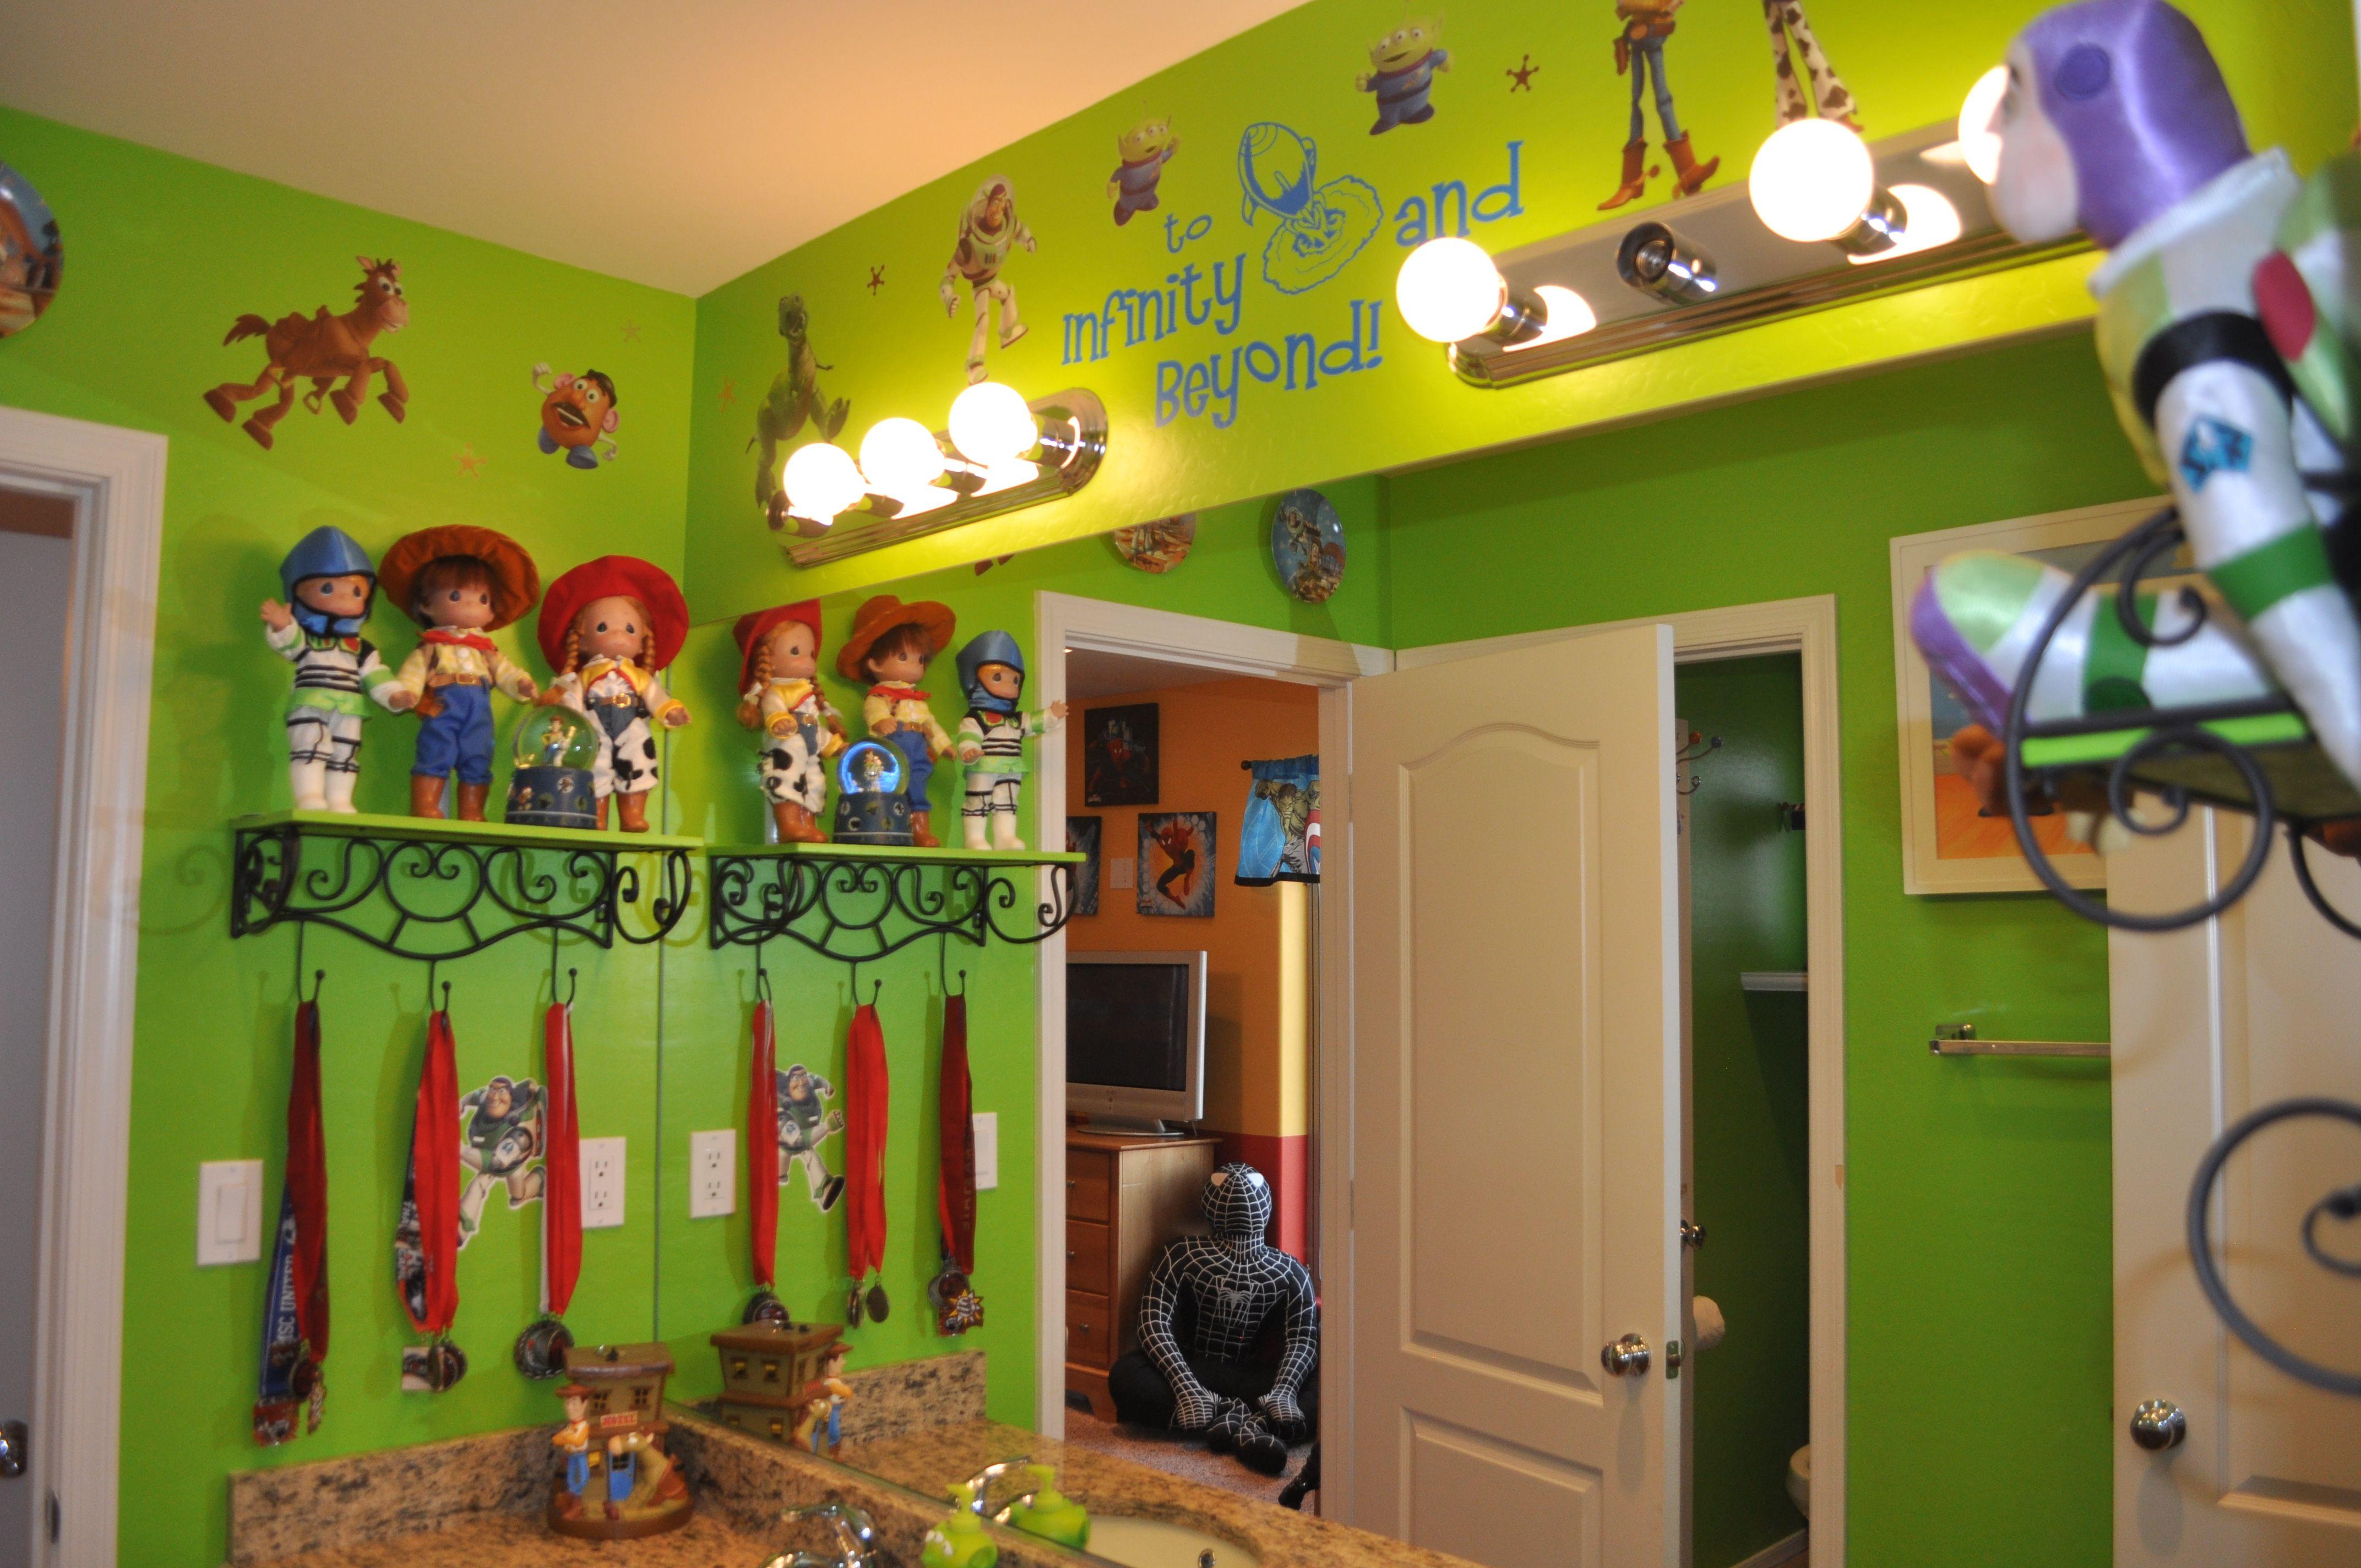 Disney Decor   Toy Story bathroom  Disneyland www mydisneylove com. Disney Decor   Toy Story bathroom  Disneyland www mydisneylove com